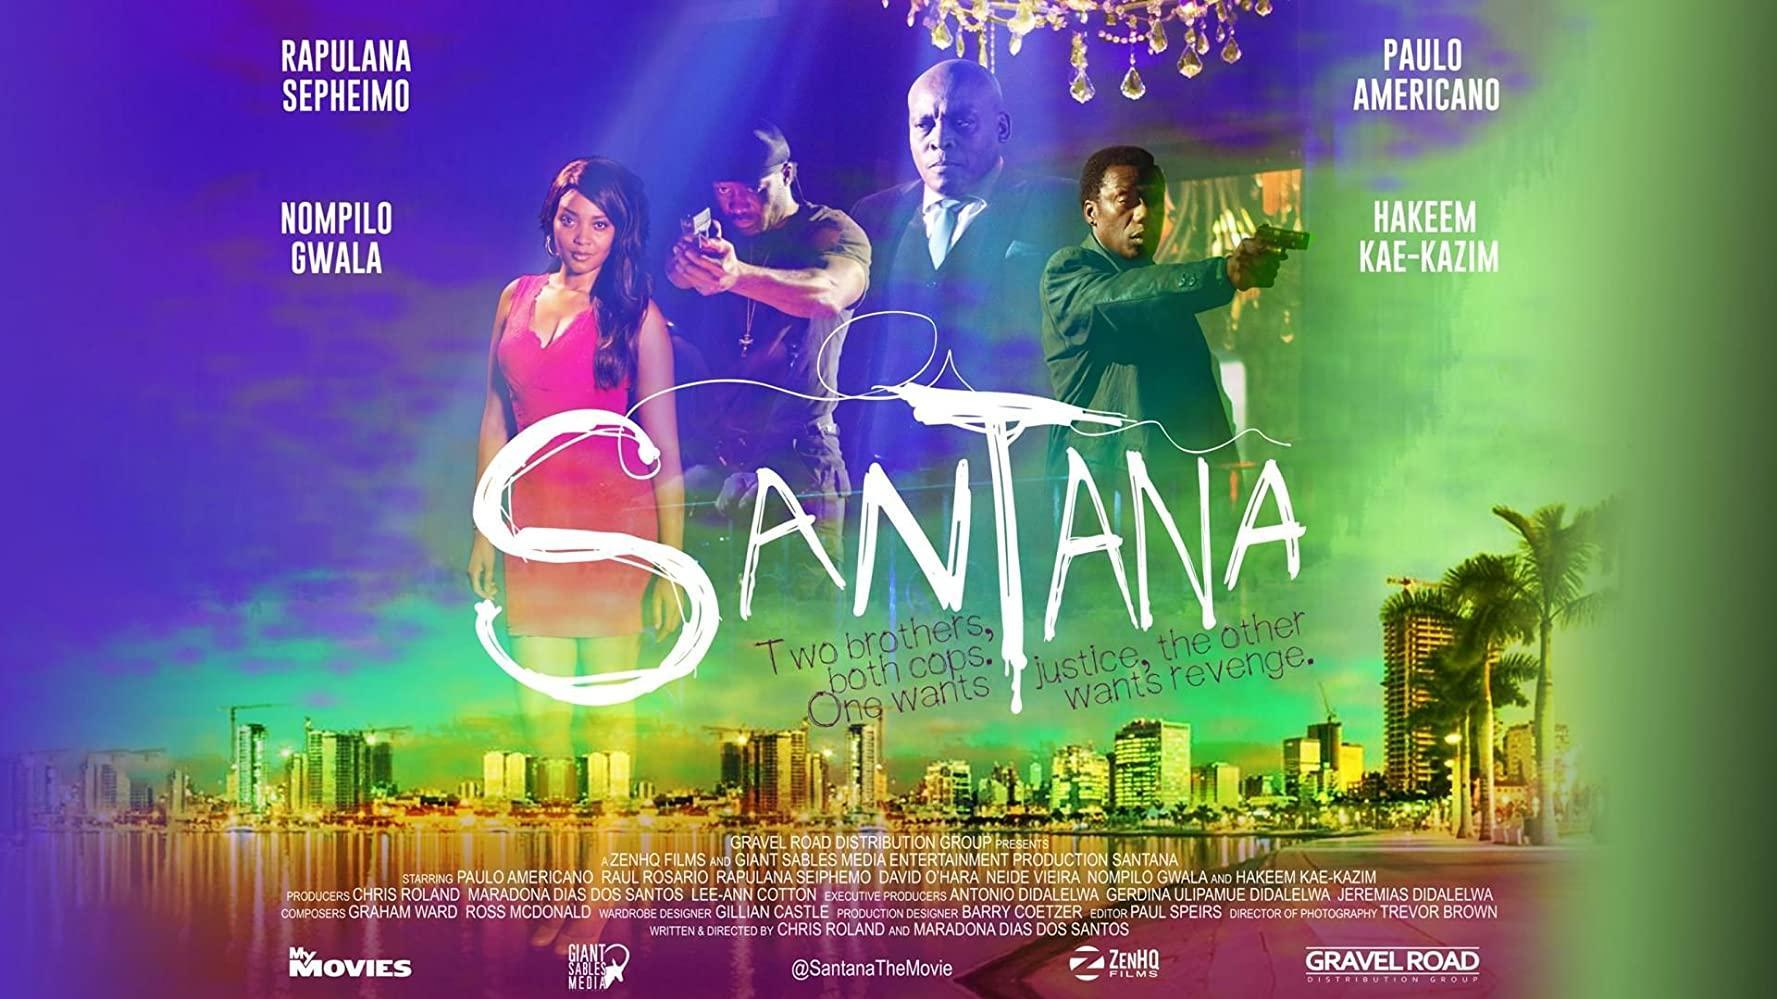 مشاهدة فيلم Santana (2020) مترجم HD اون لاين